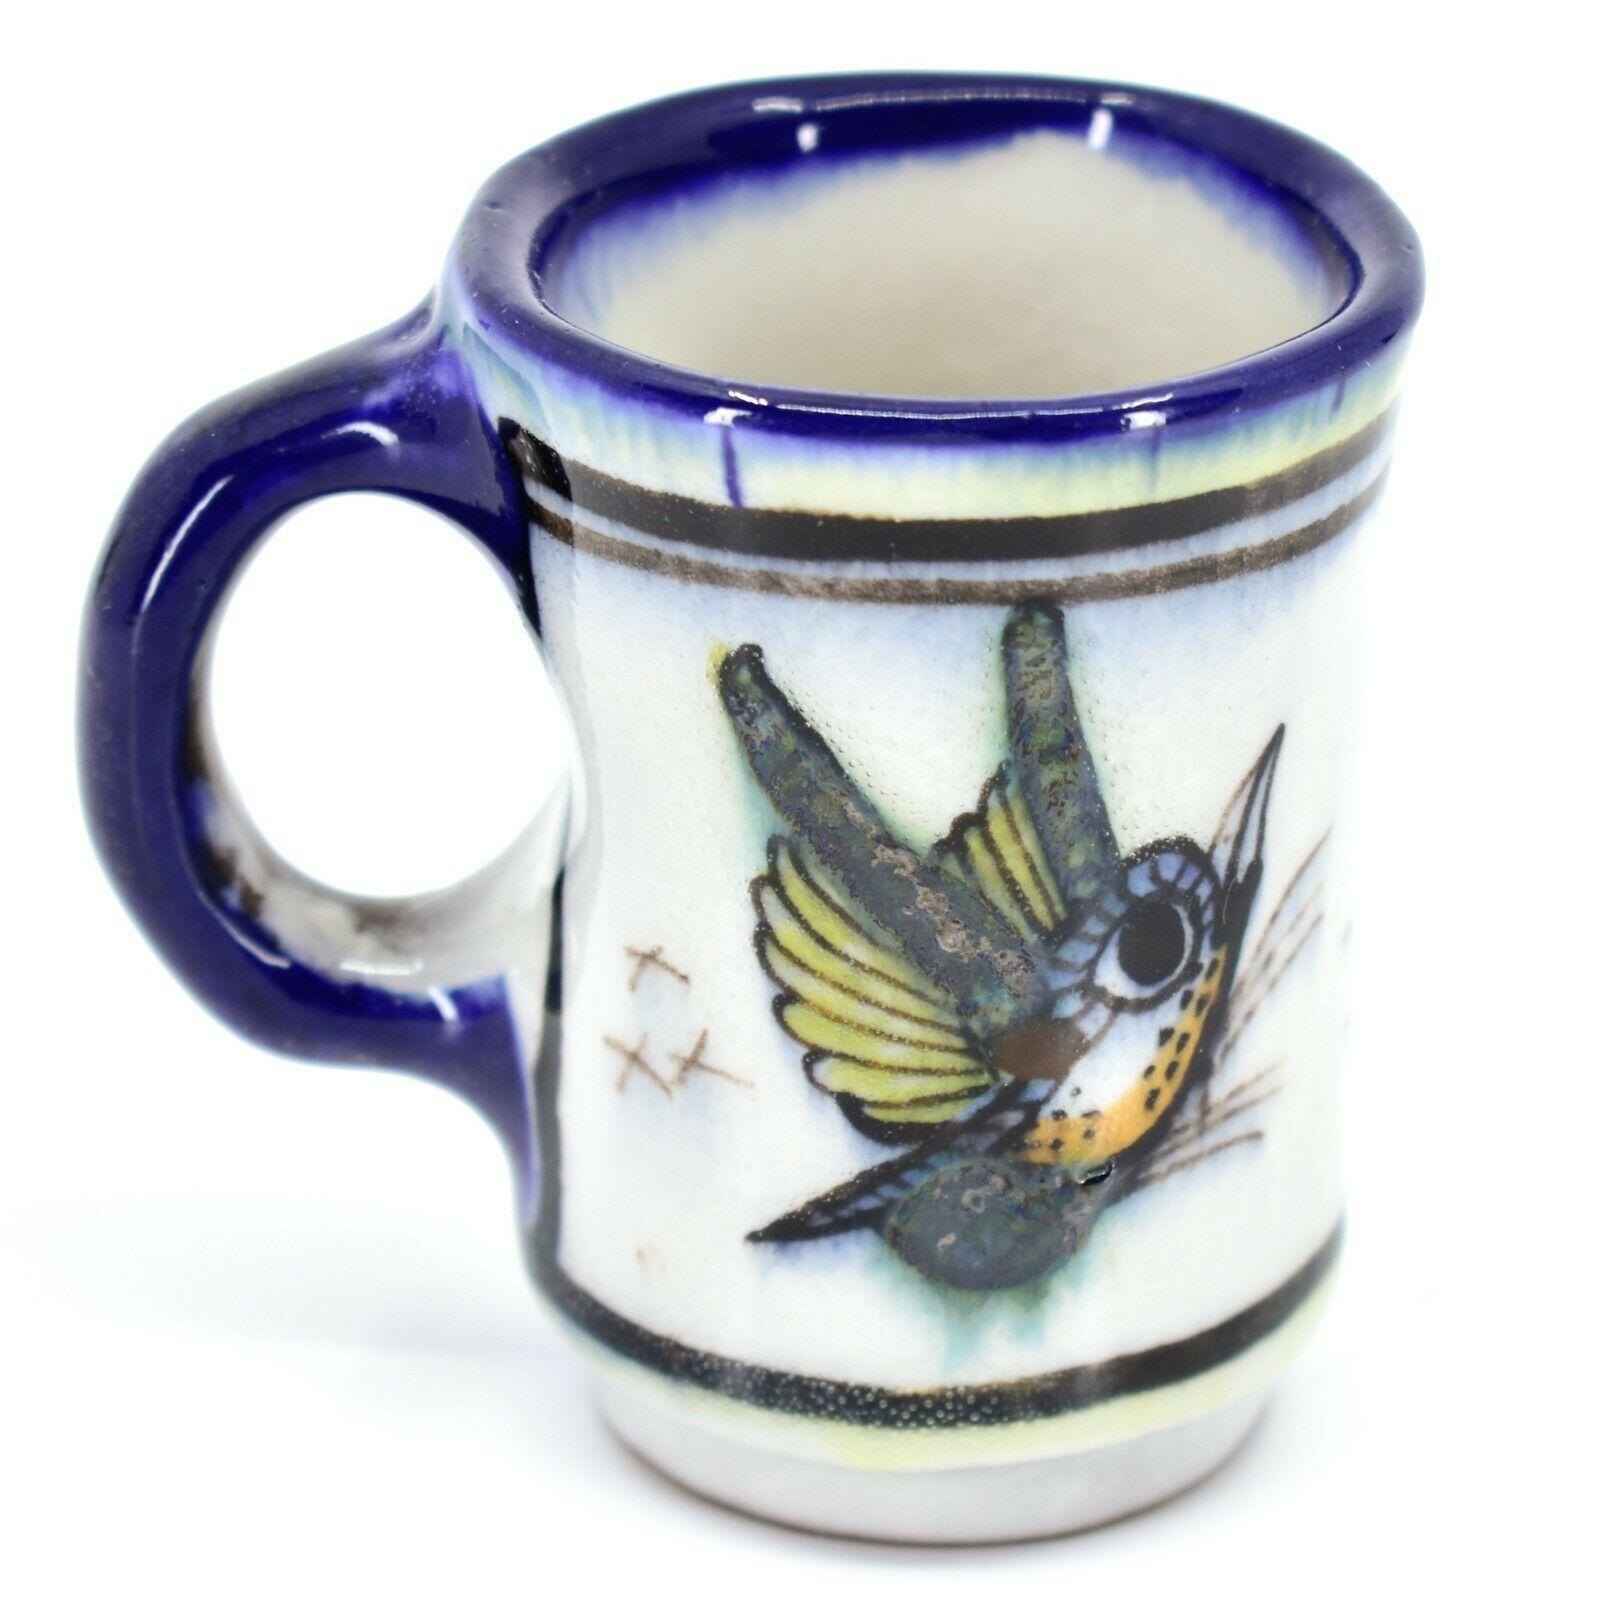 Ceramic Hand Painted Hummingbird & Flower Espresso Cup Mug Handmade Guatemala